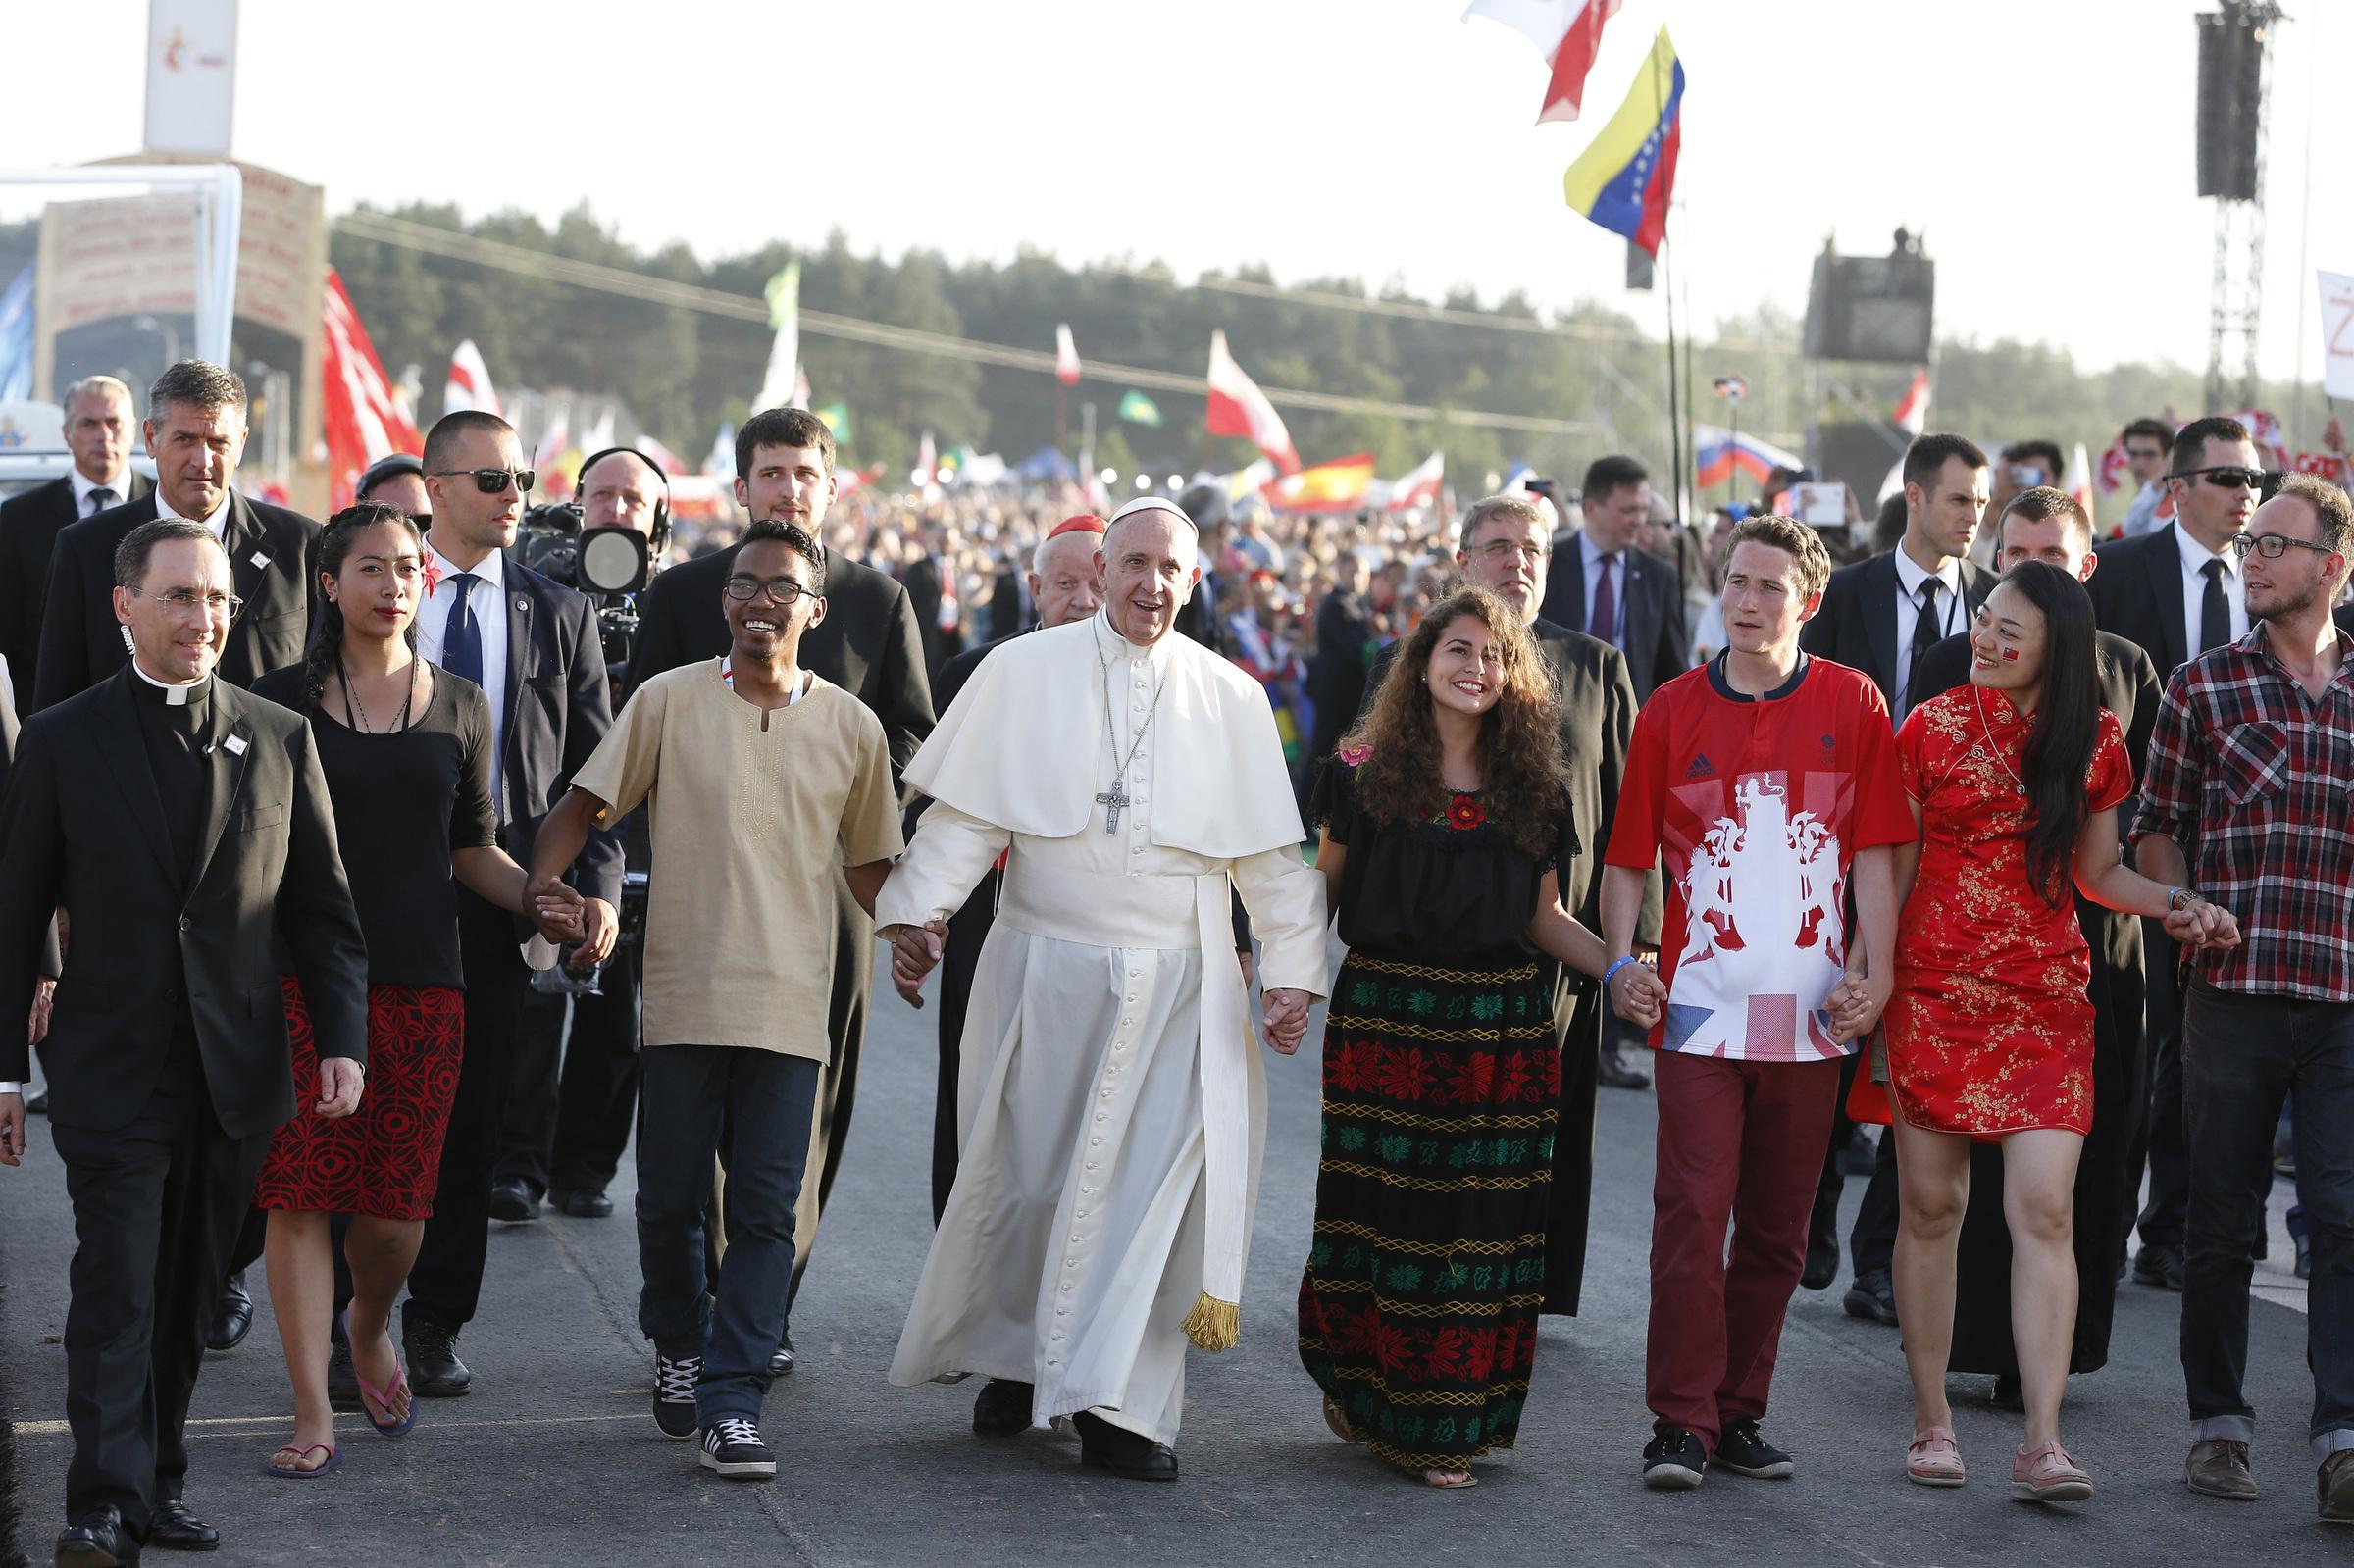 Pope walks with pilgrims